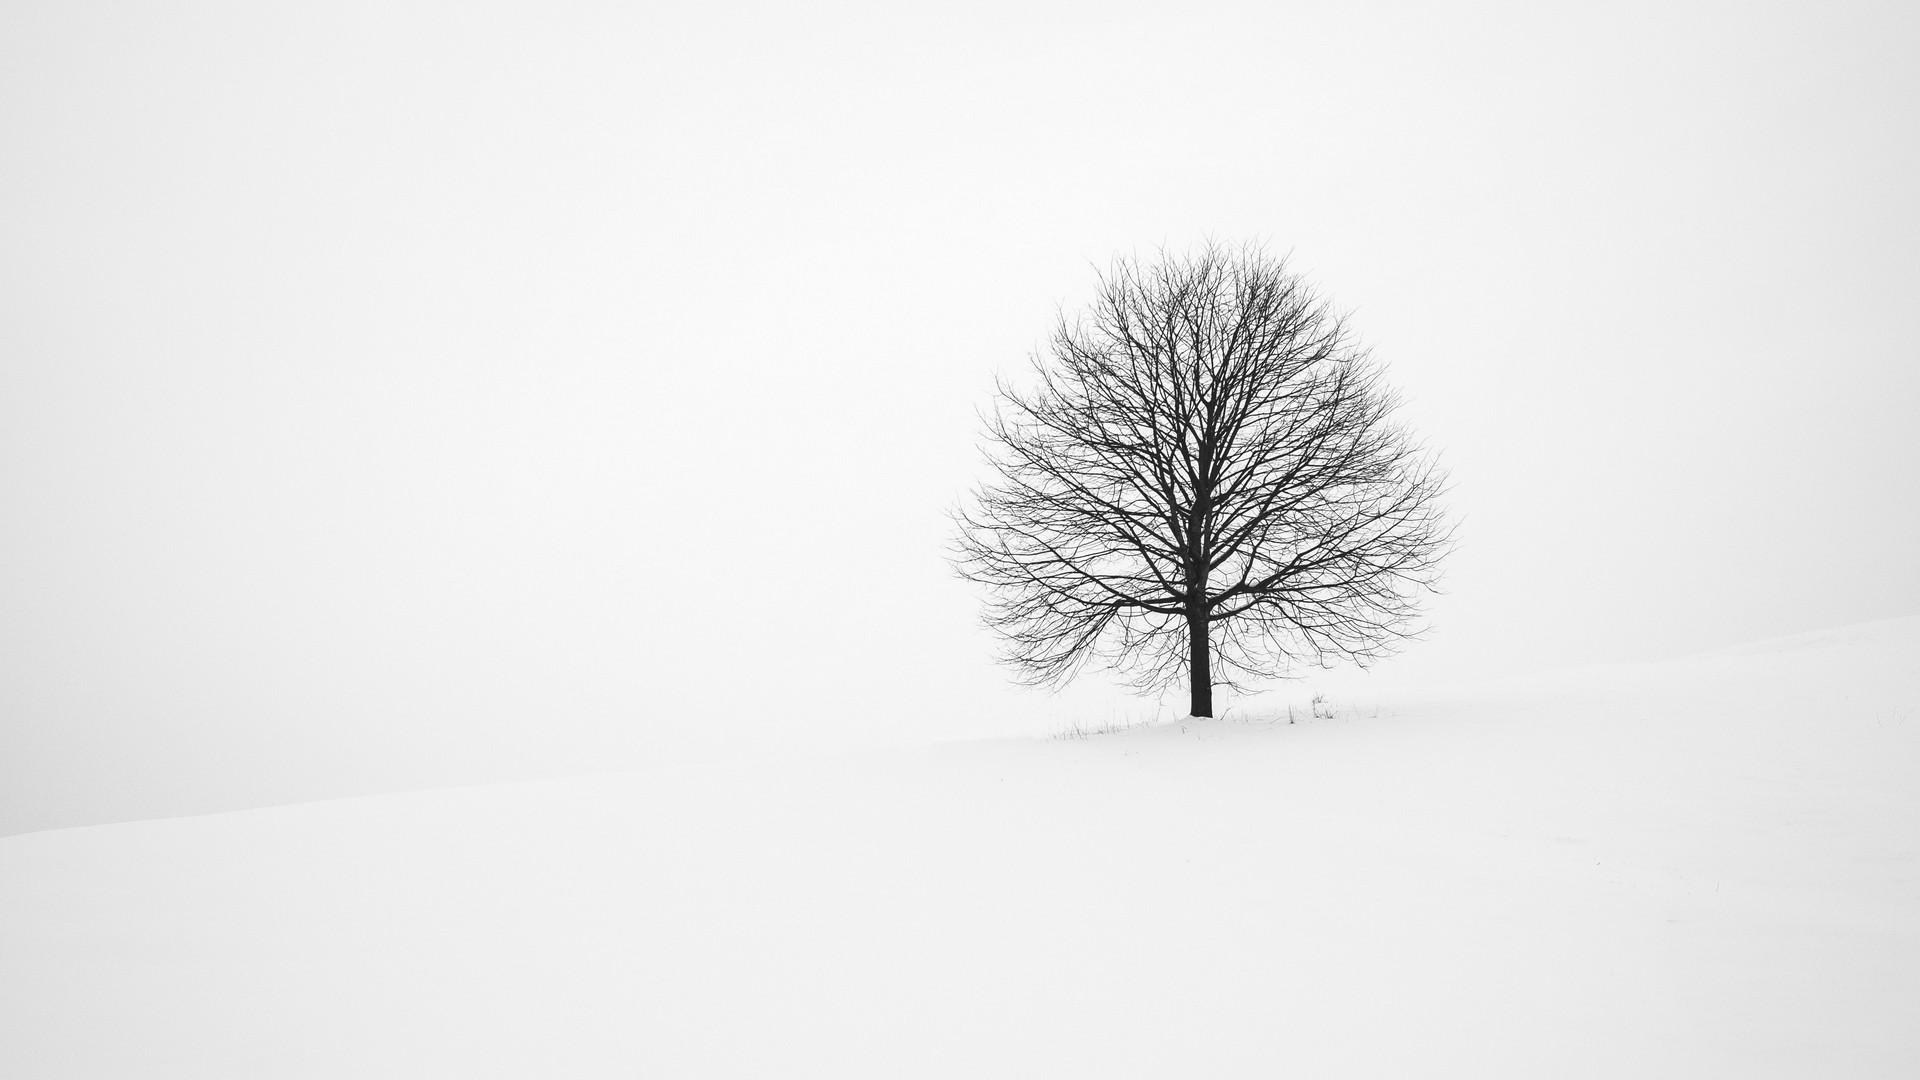 Tree Minimalist Background Wallpaper